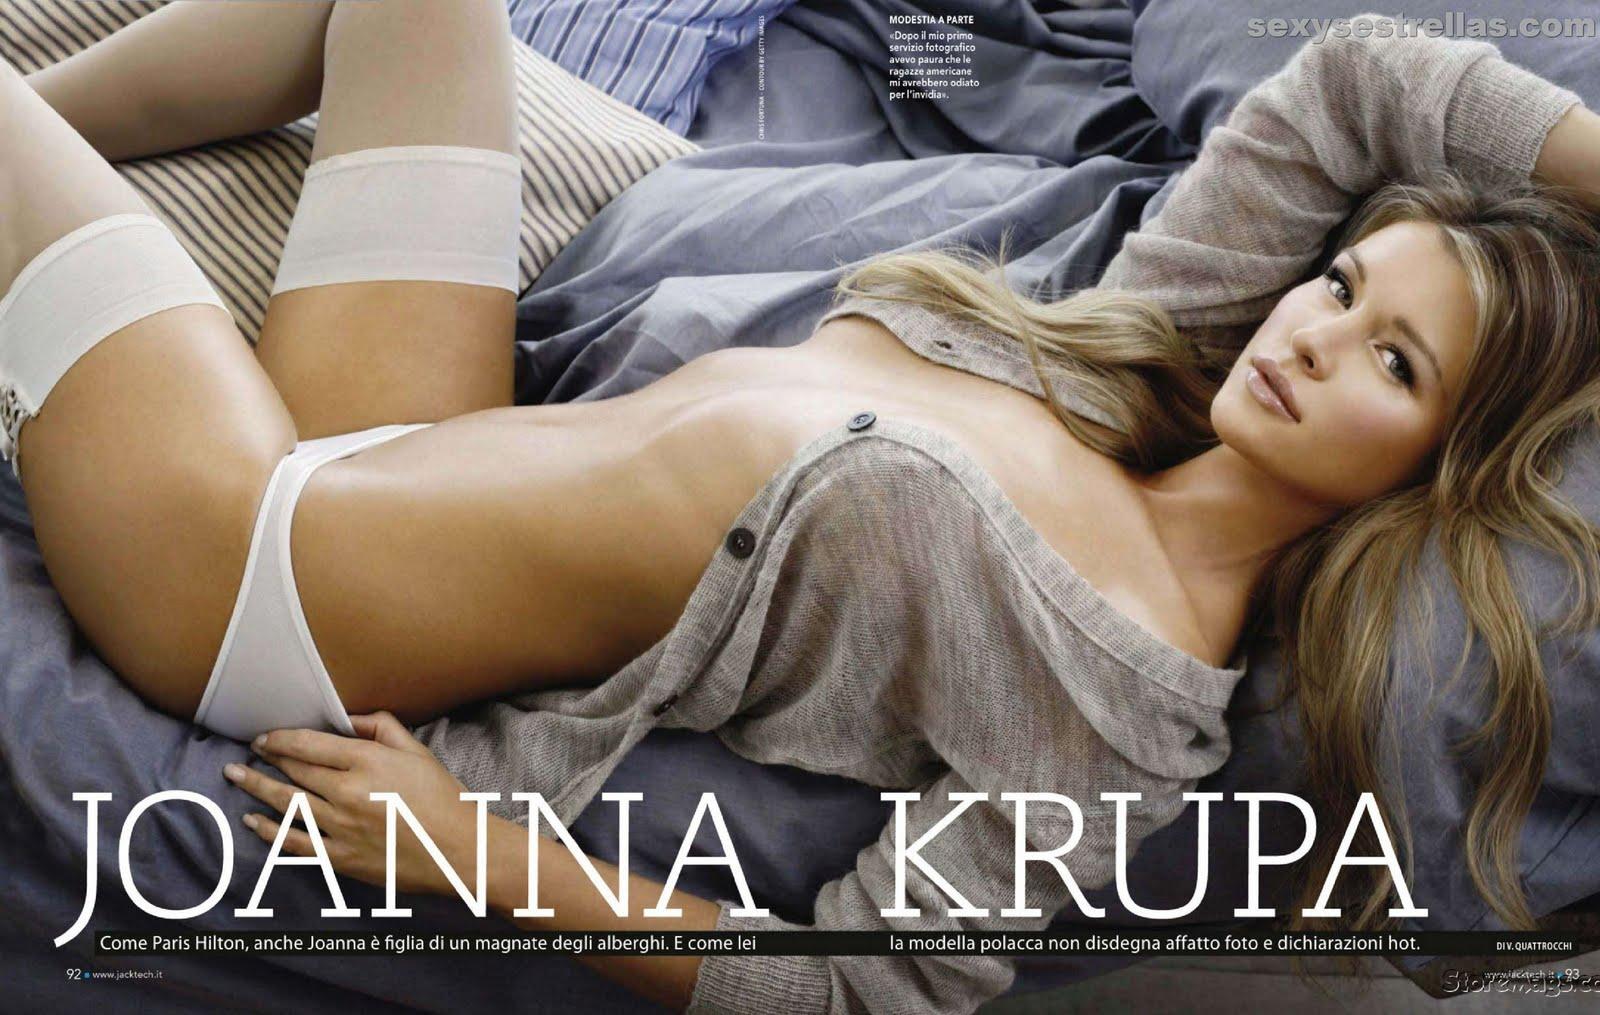 http://4.bp.blogspot.com/-bpSlL7rKKzI/Tk7gHXvhACI/AAAAAAAAH_E/SQO6FIv-THA/s1600/Joanna-Krupa-wallpaper.jpg